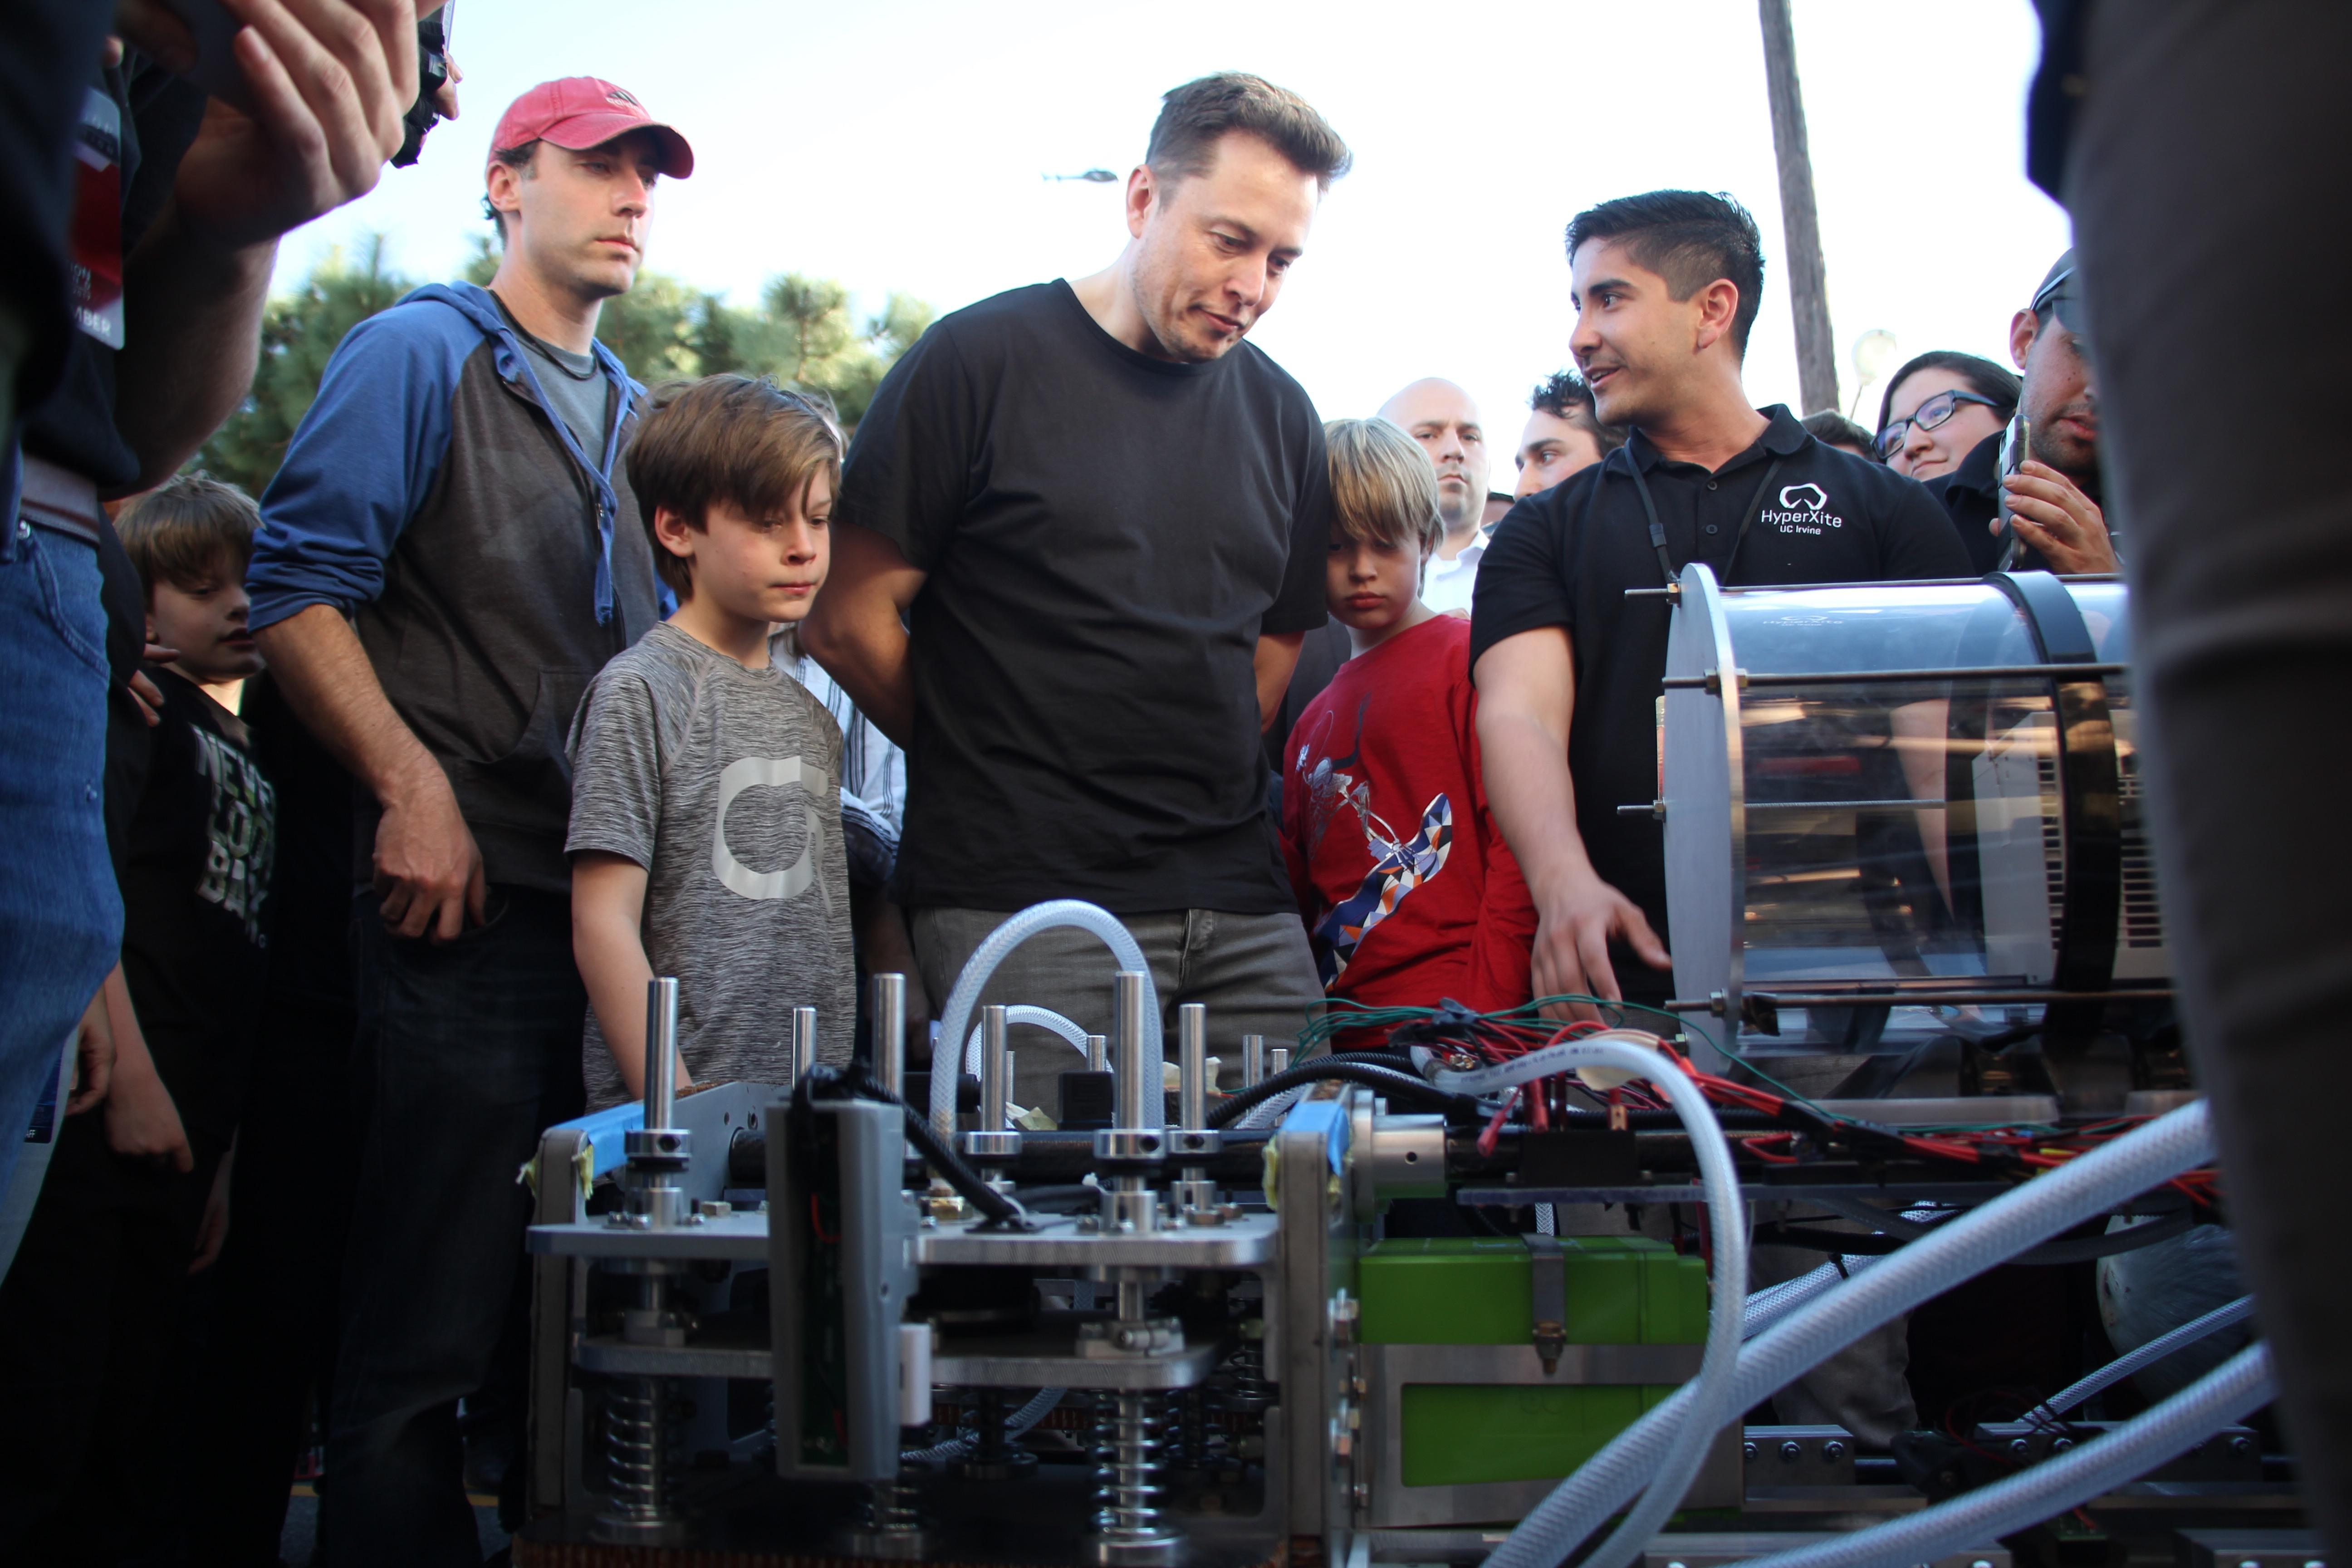 Elon Musk and Hyperloop